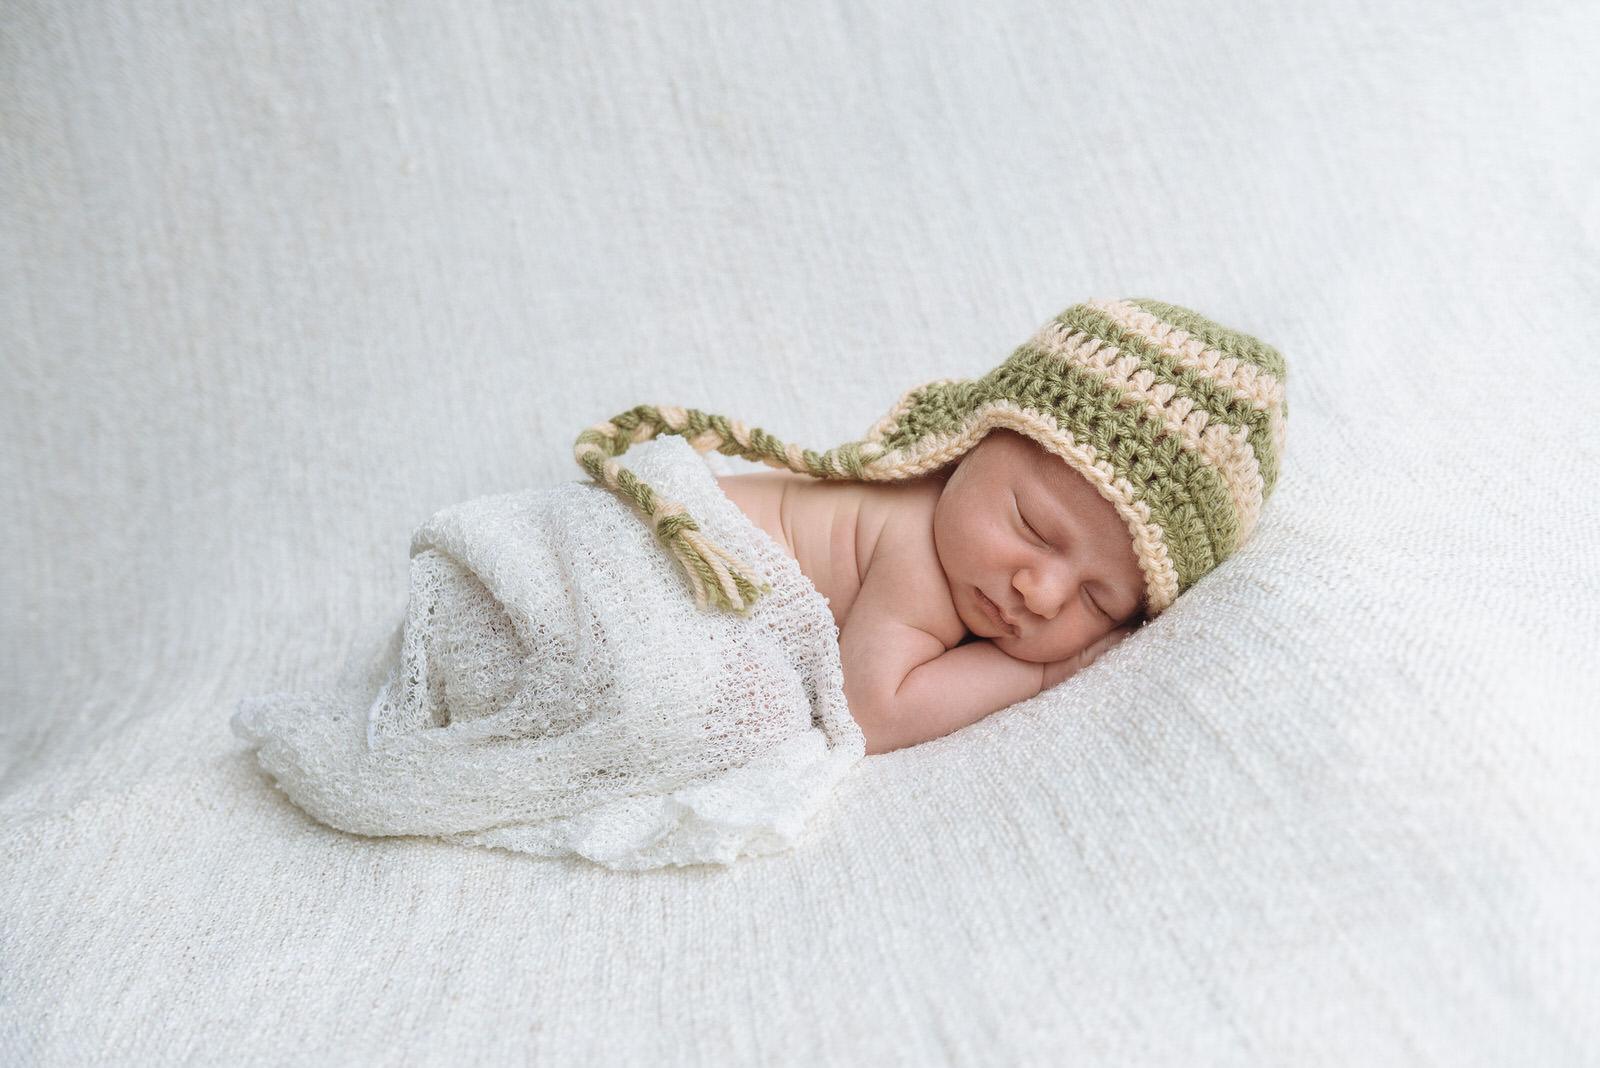 Sleeping newborn - Uckfield newborn baby photographer